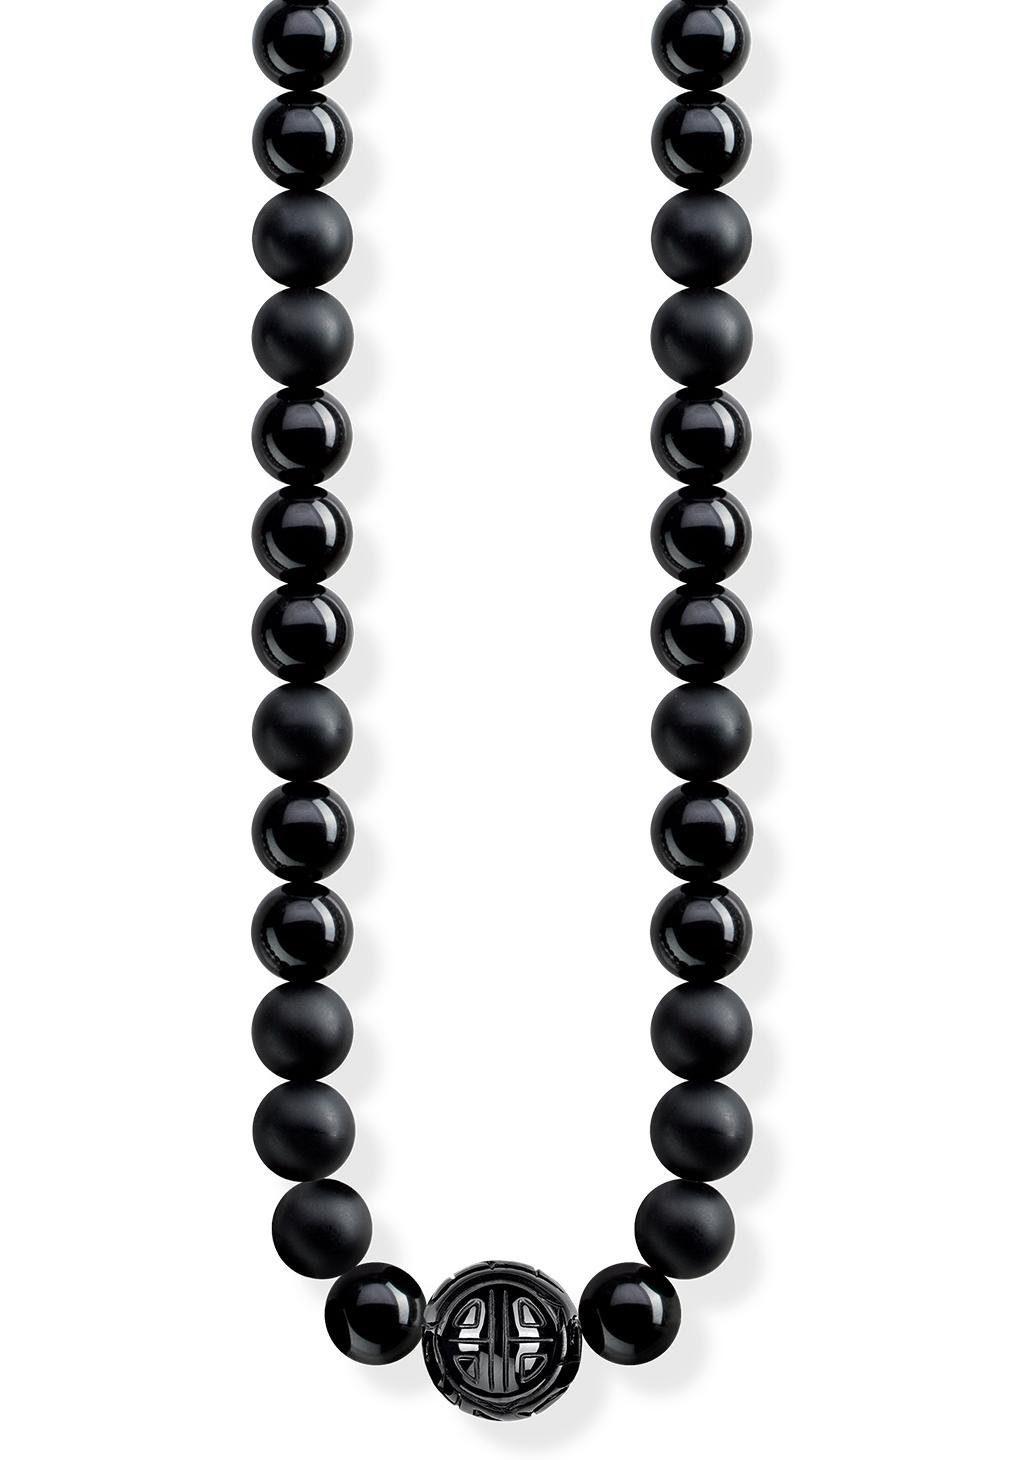 THOMAS SABO Kette mit Anhänger »Power Necklace Schwarz, KE1674-704-11-L100« mit Obsidian